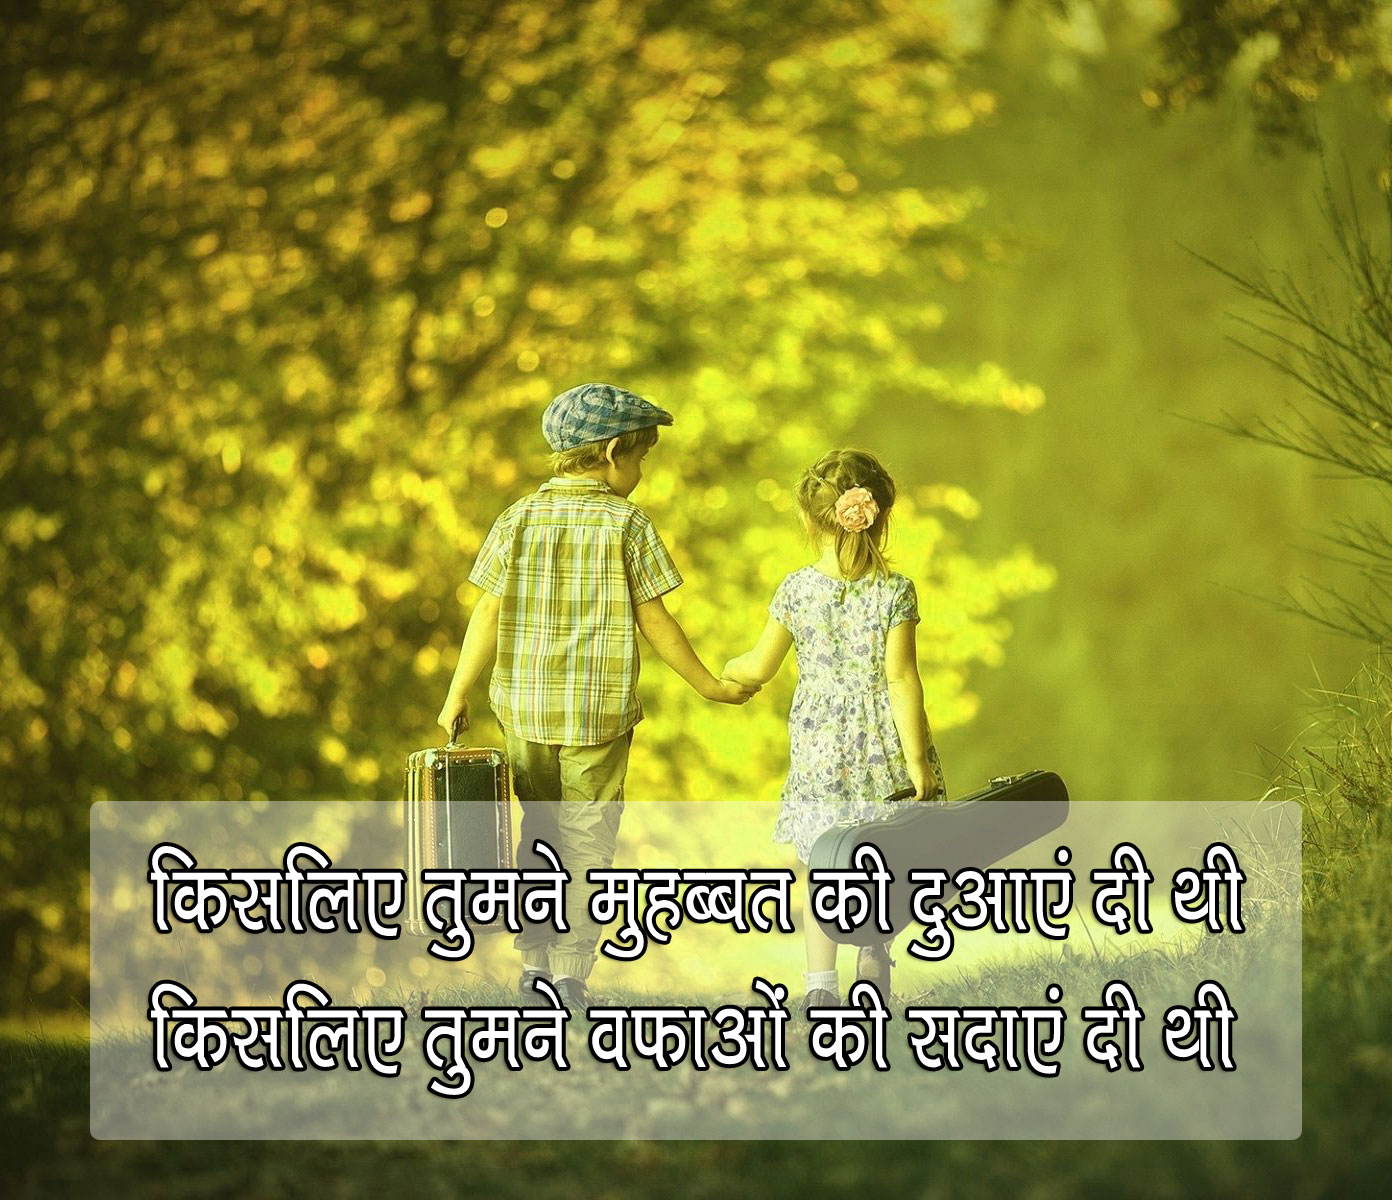 Best Hindi Shayari Images 11